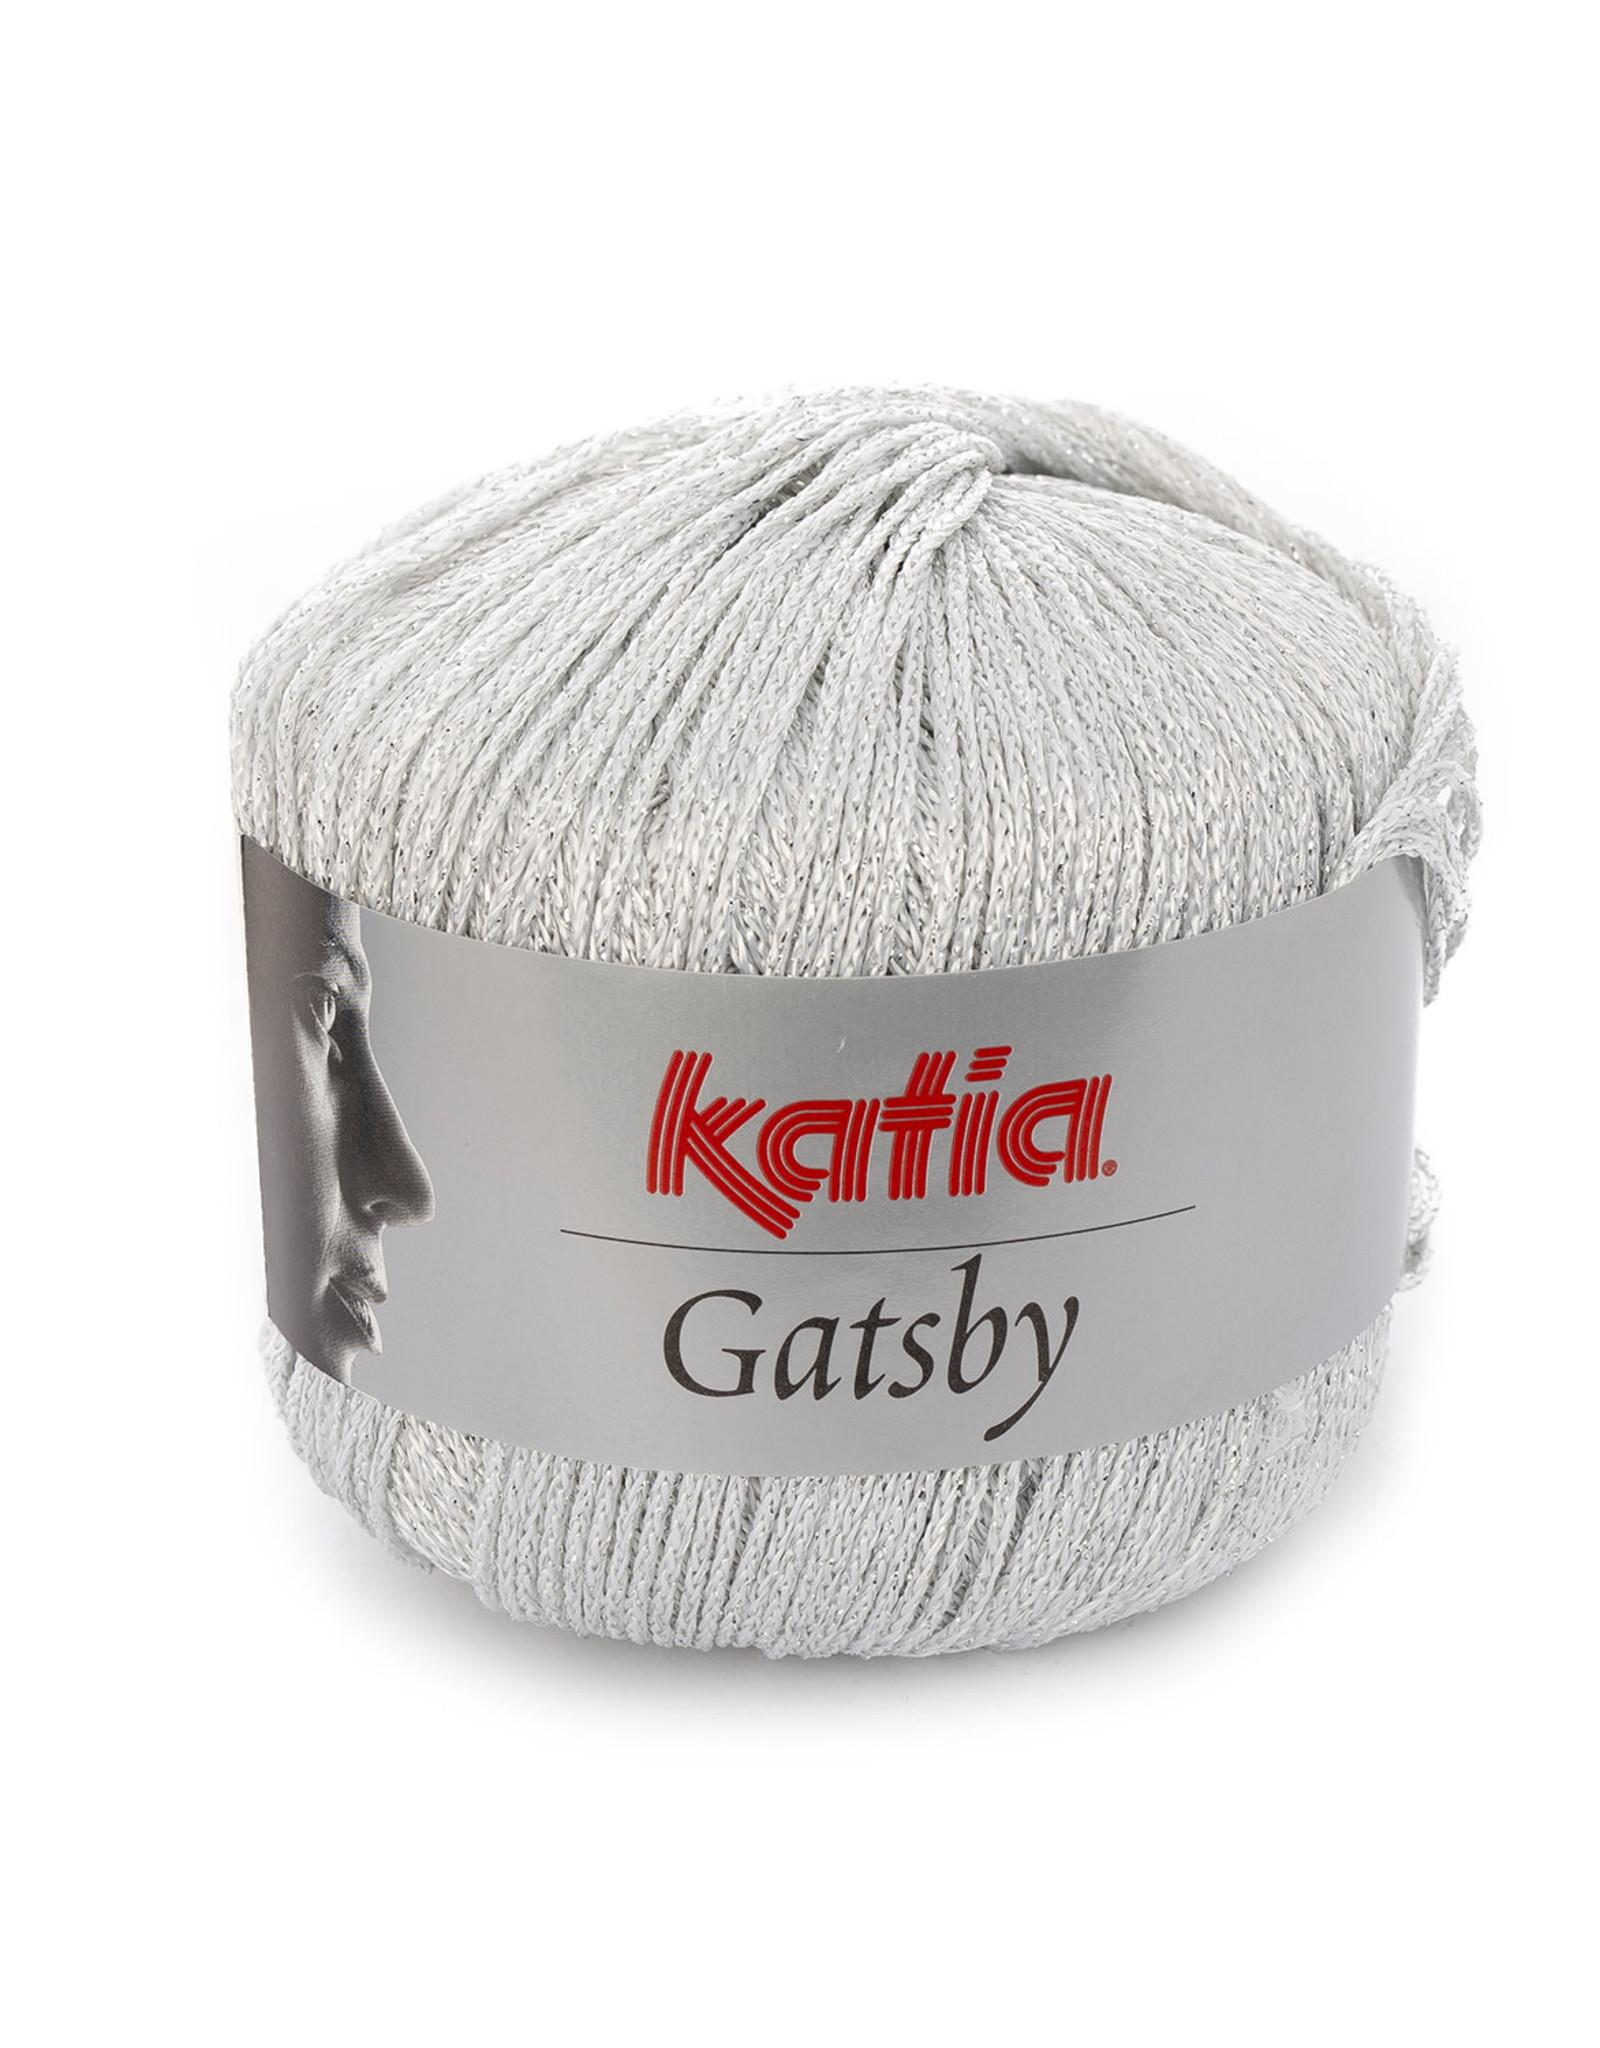 Katia Katia Gatsby 88500 - Wit-Zilver